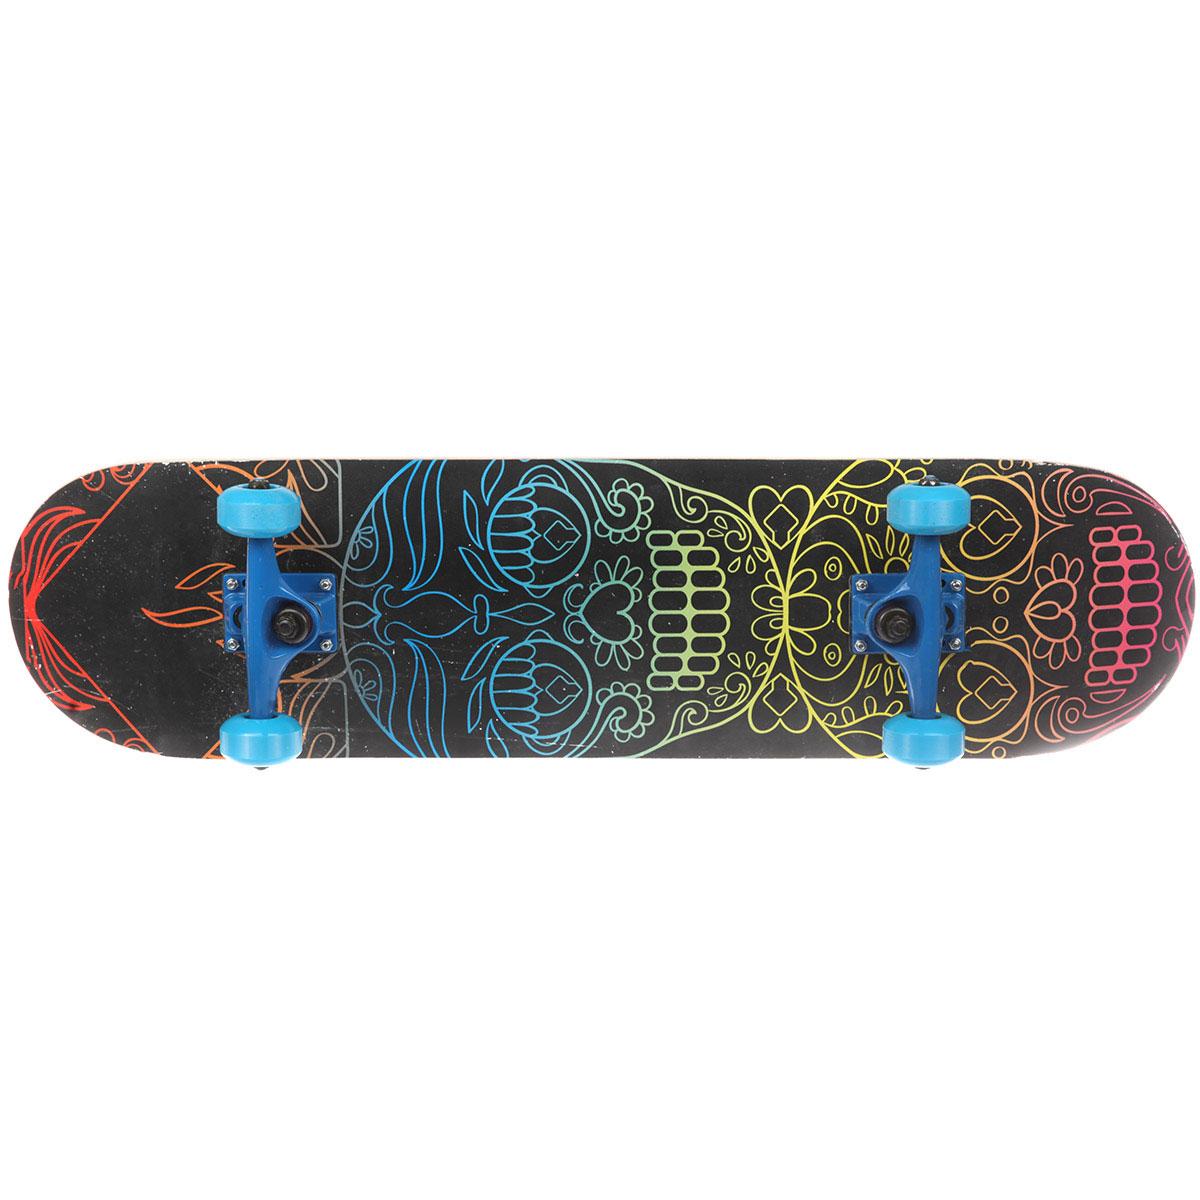 Скейтборд в сборе Turbo-FB Skull Multicolor 31.5 x 8.25 (21 см)